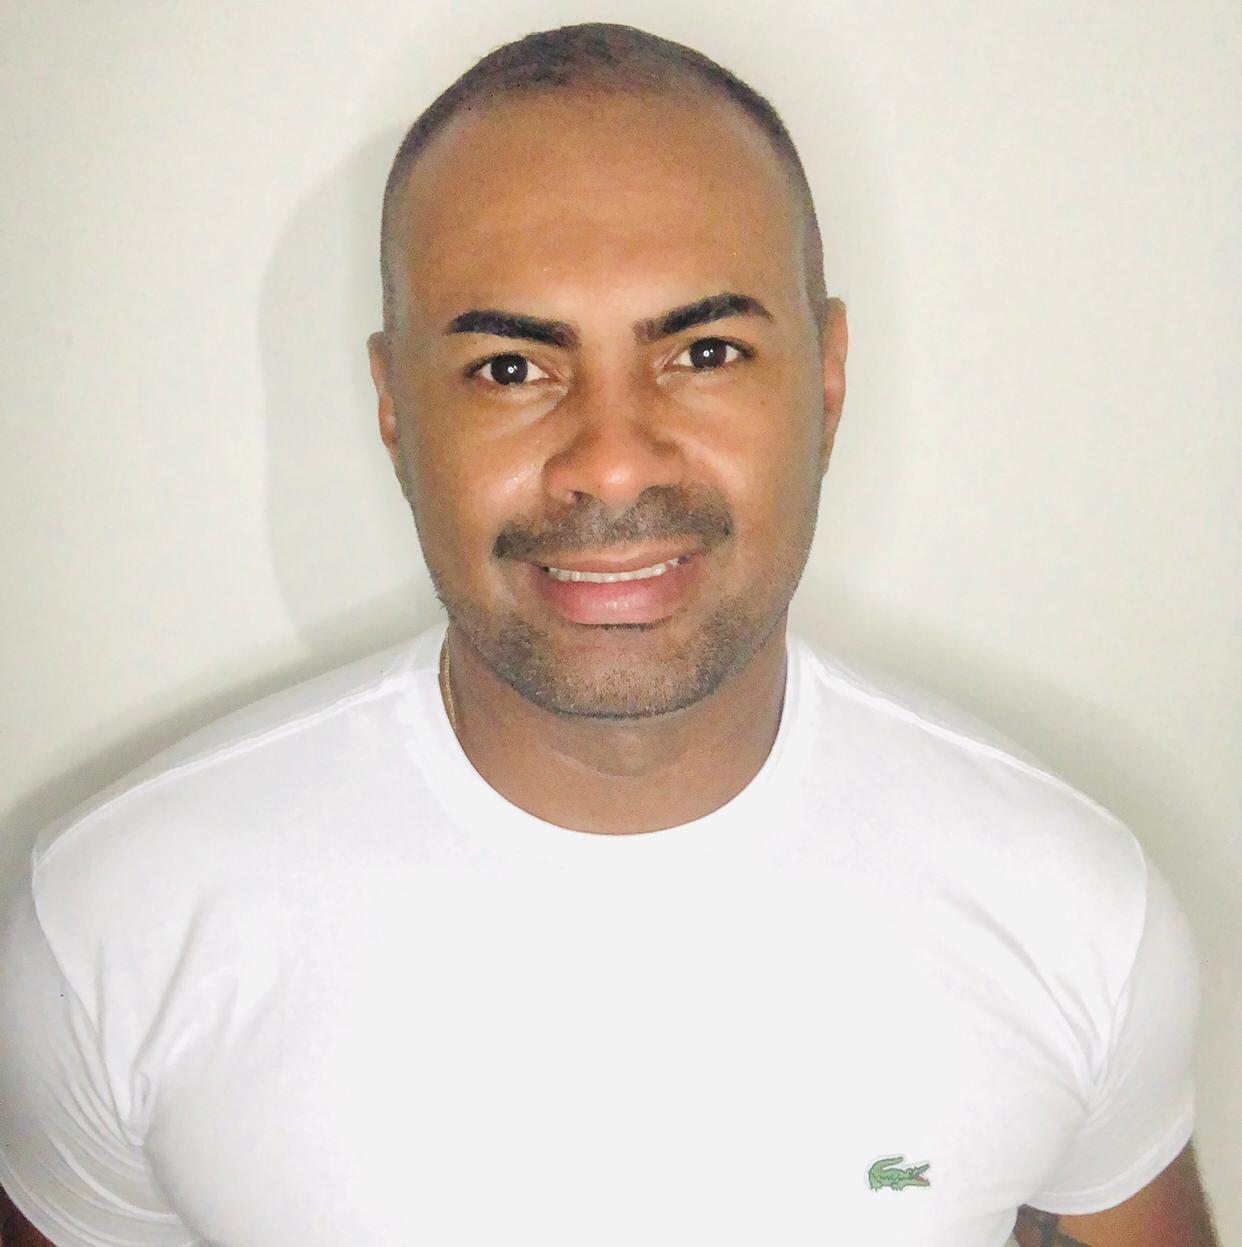 Rangel Correia